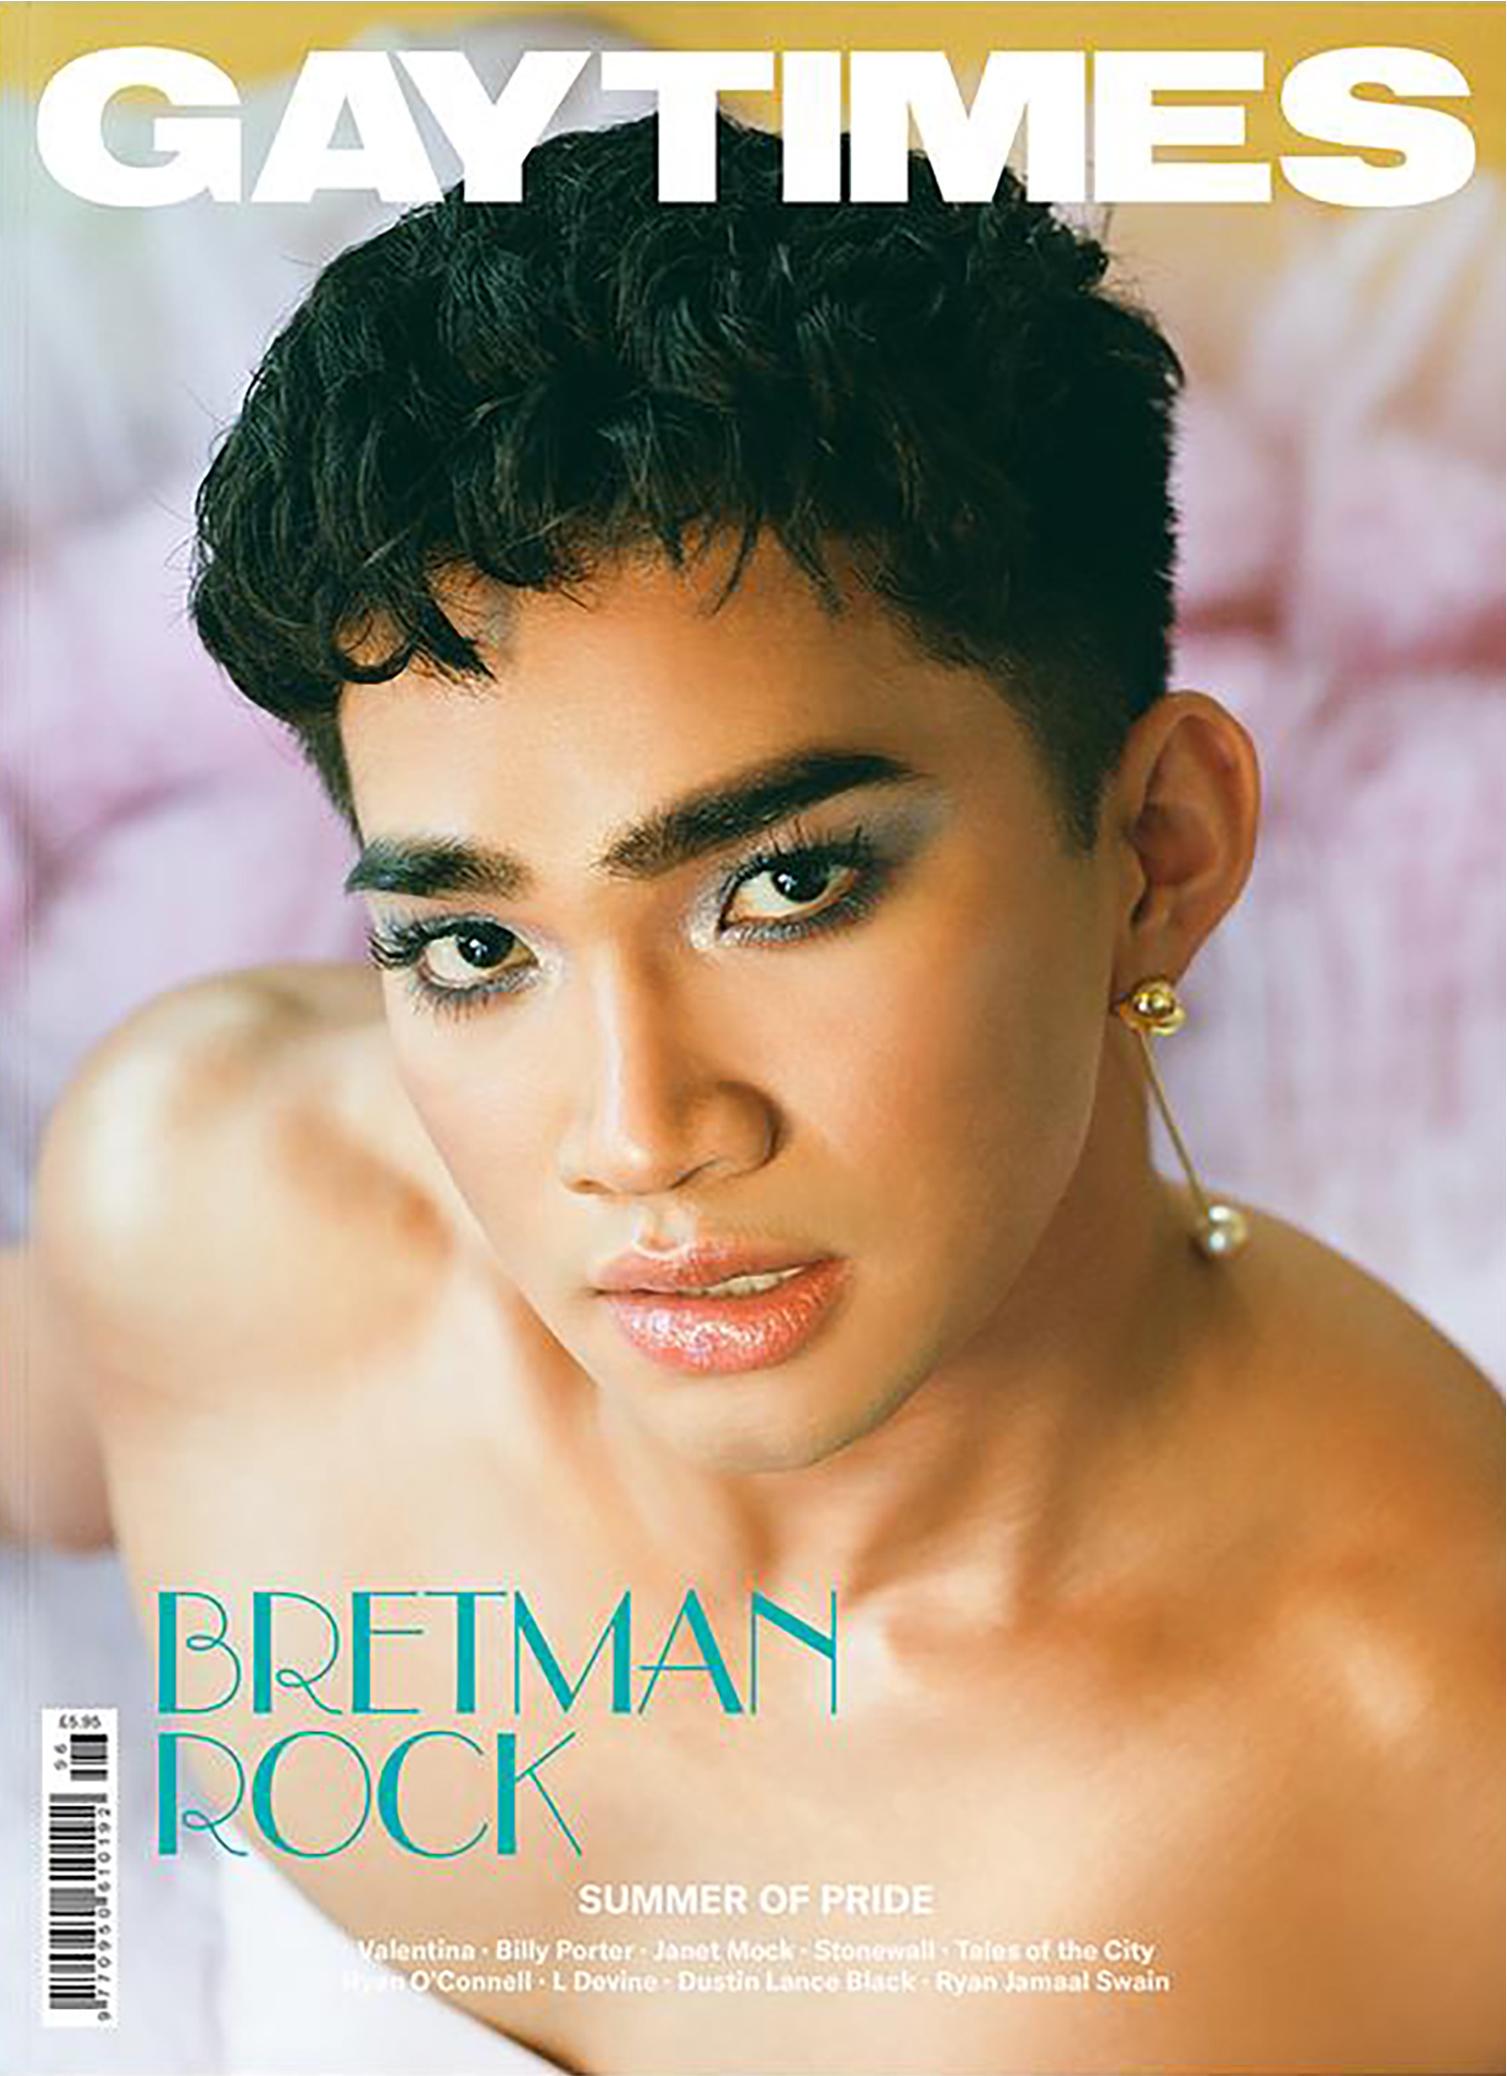 496-SOCIAL-COVER-BRETMAN_800x.jpg